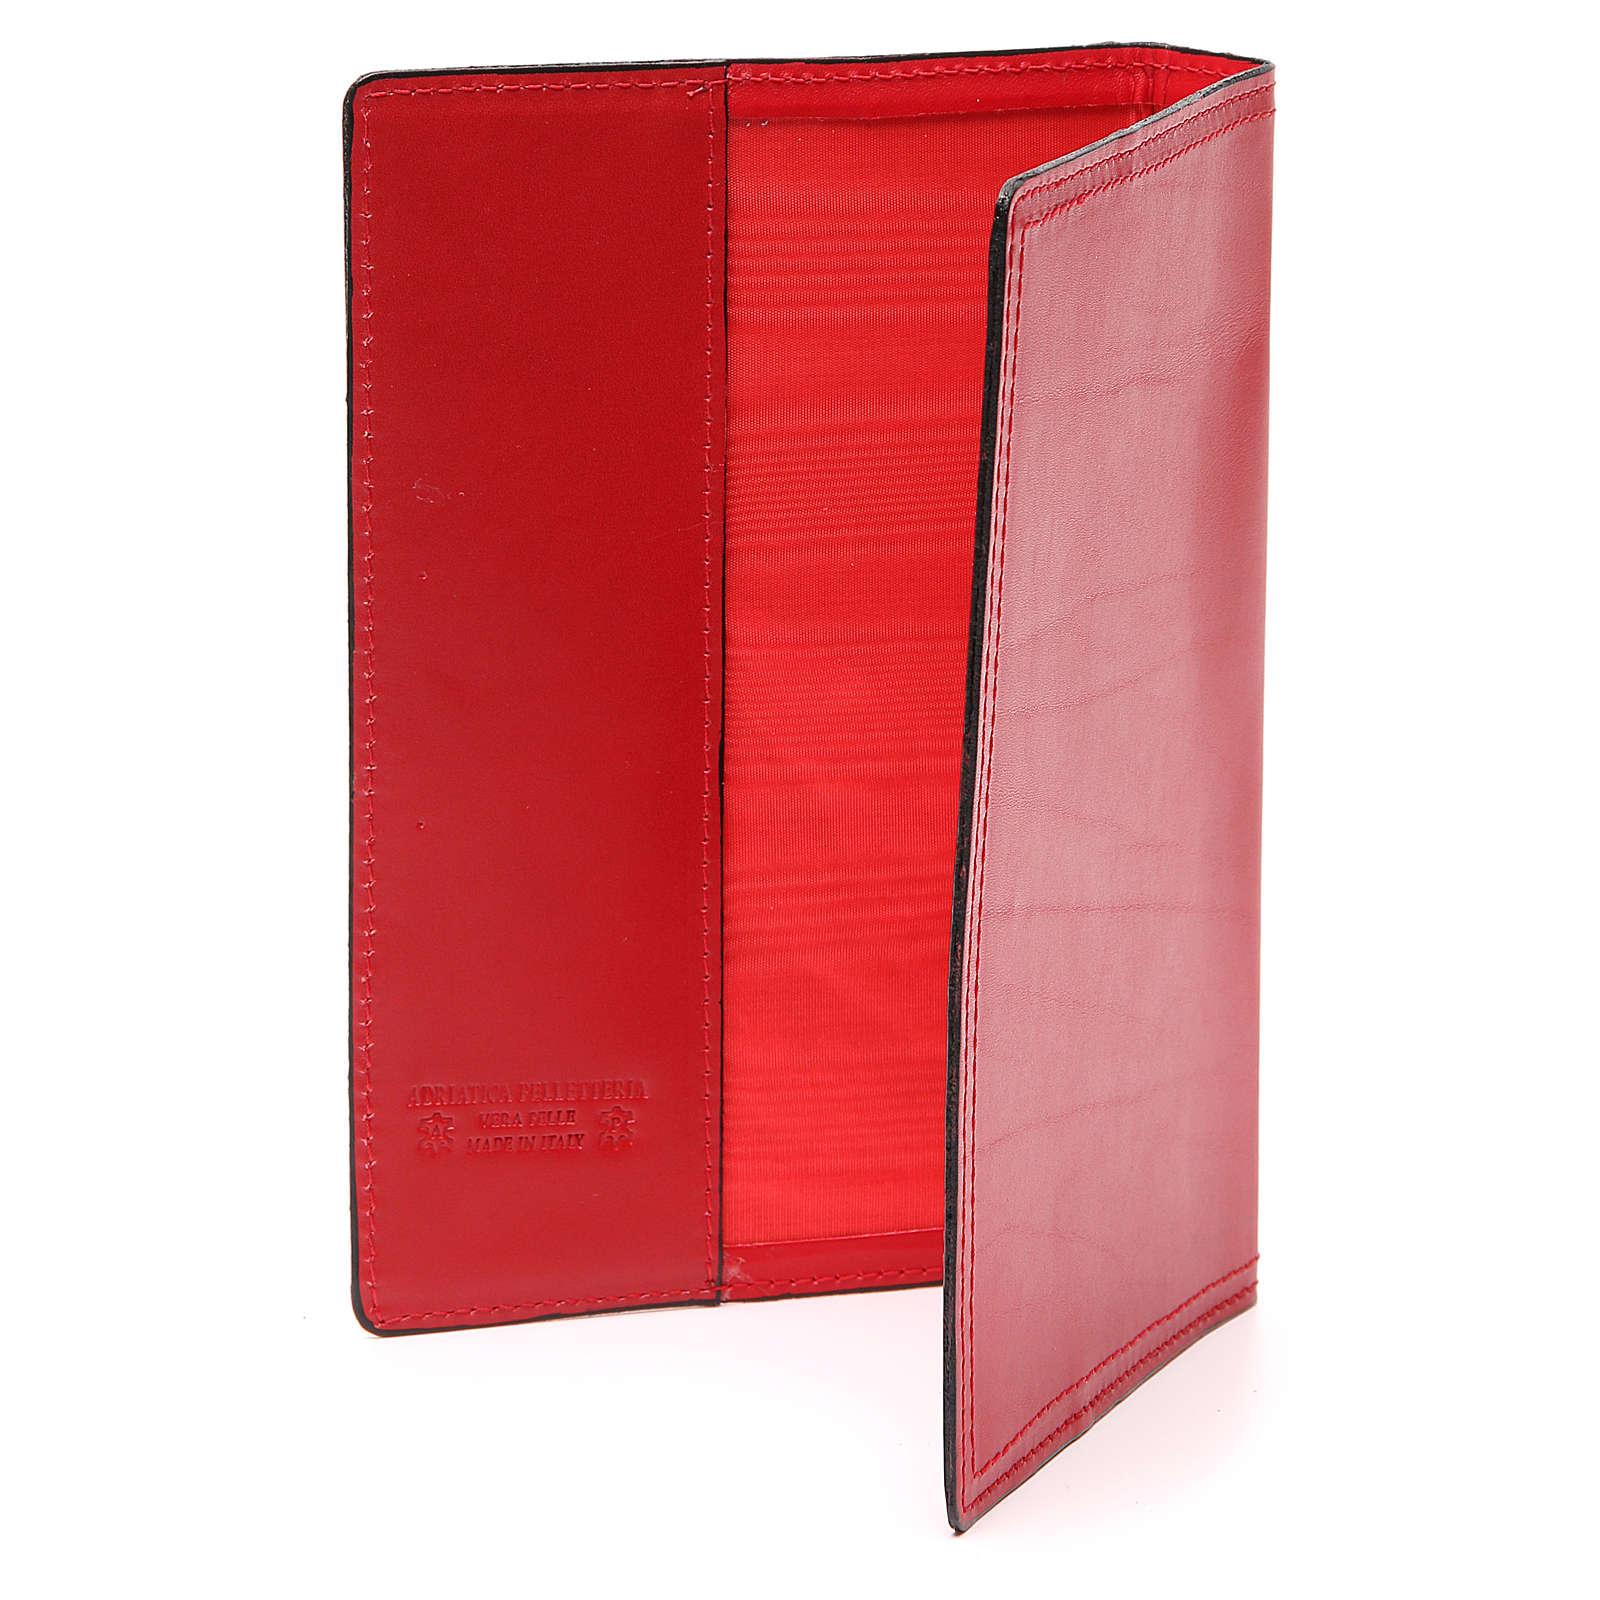 Cartella portariti A5 vera pelle rossa 4